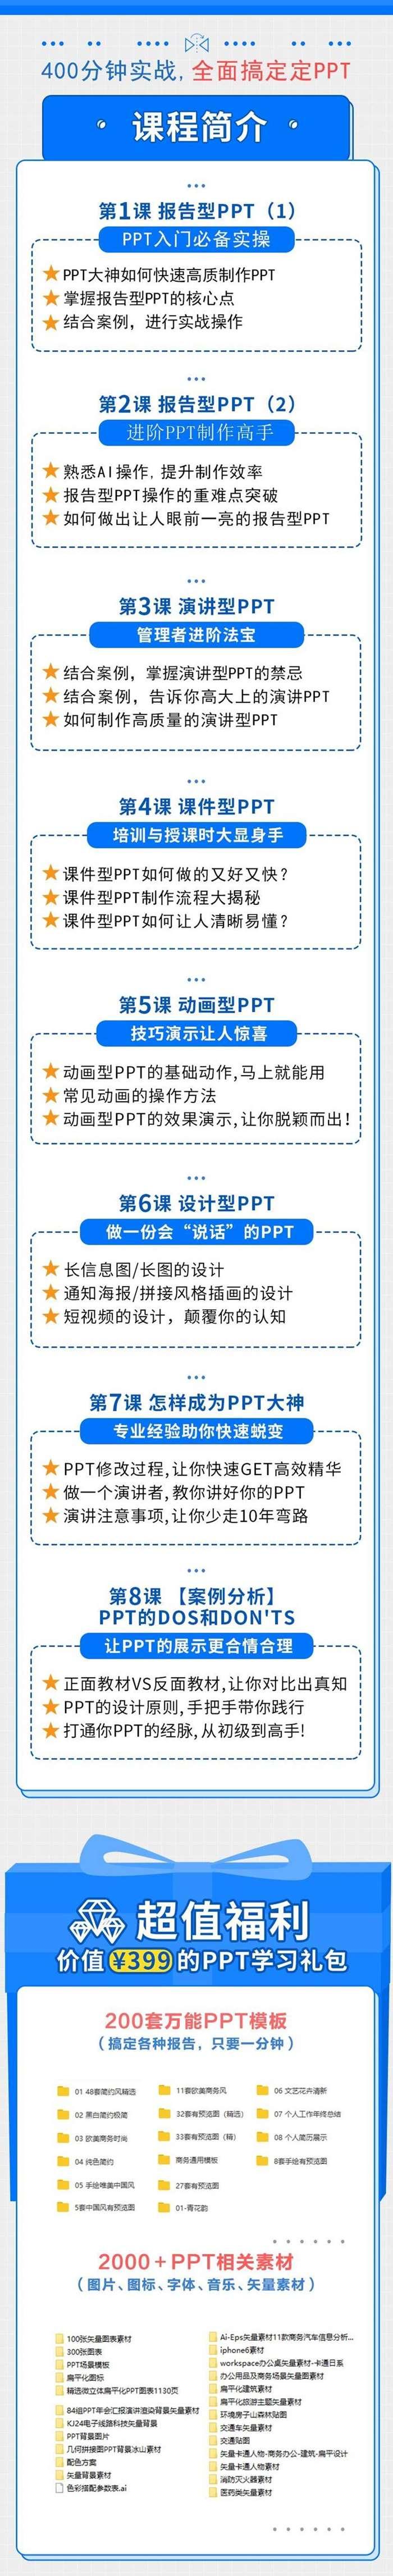 PPT课程1_02.jpg